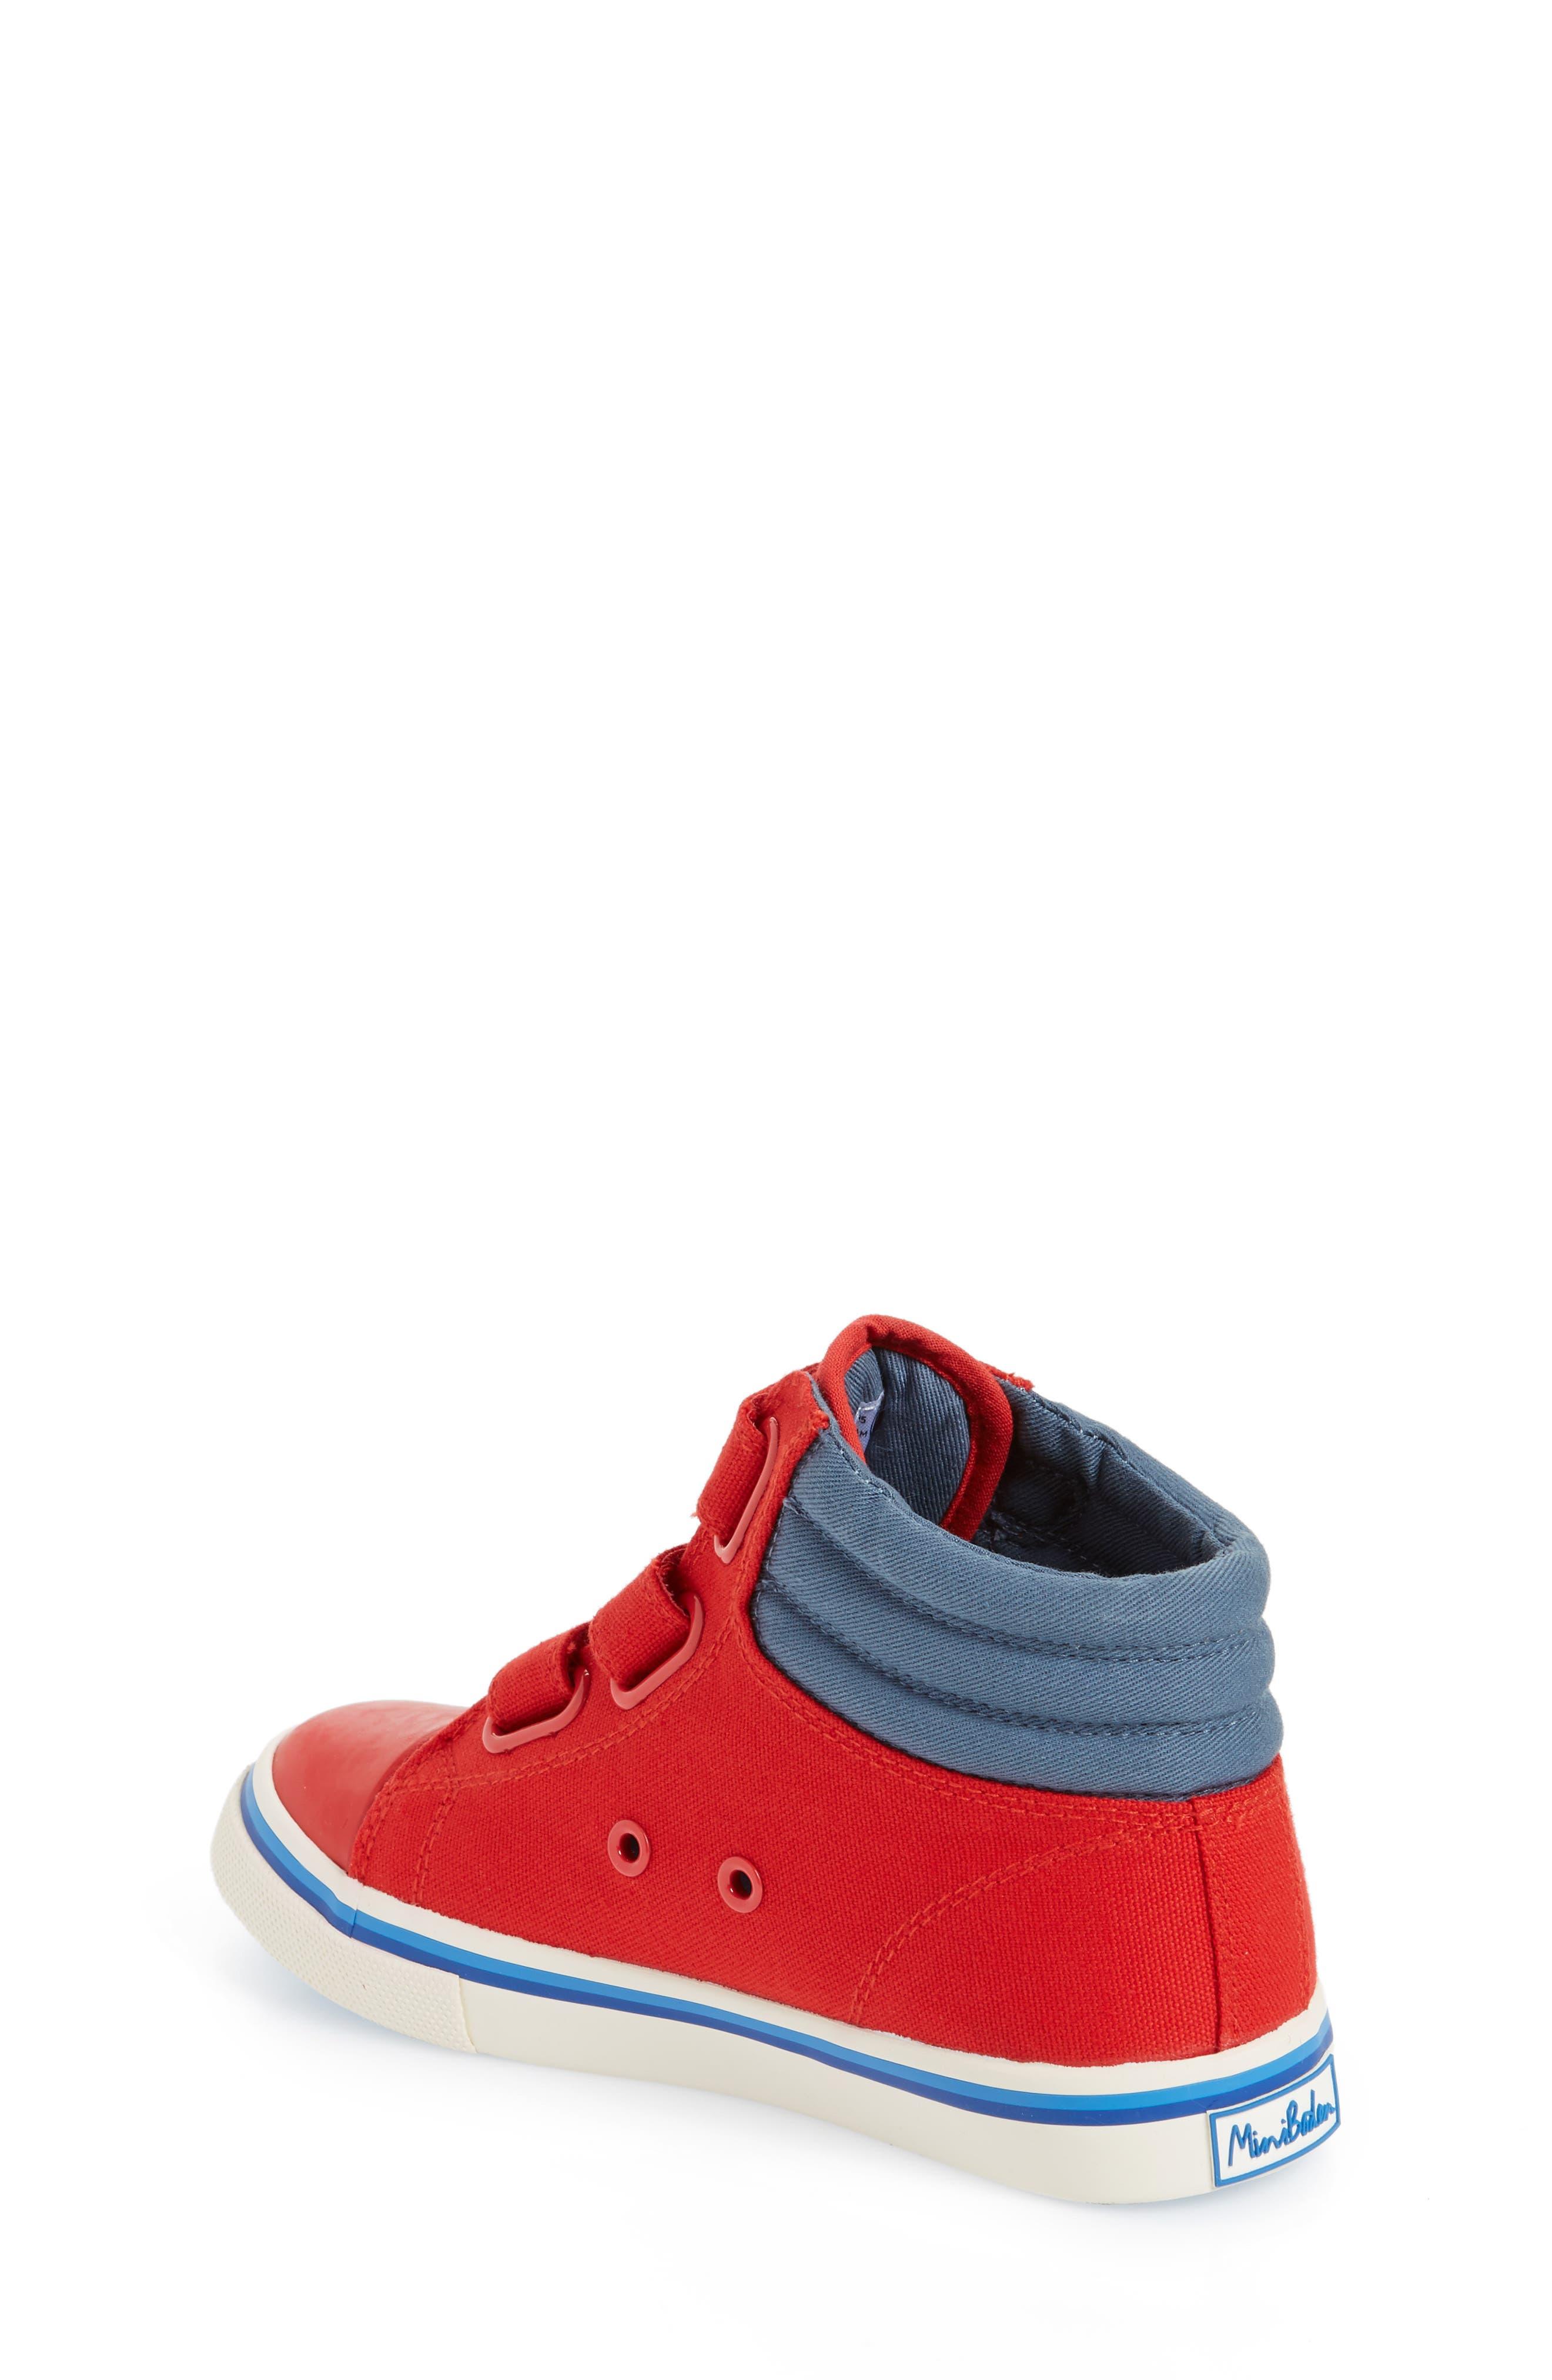 High Top Sneaker,                             Alternate thumbnail 2, color,                             614